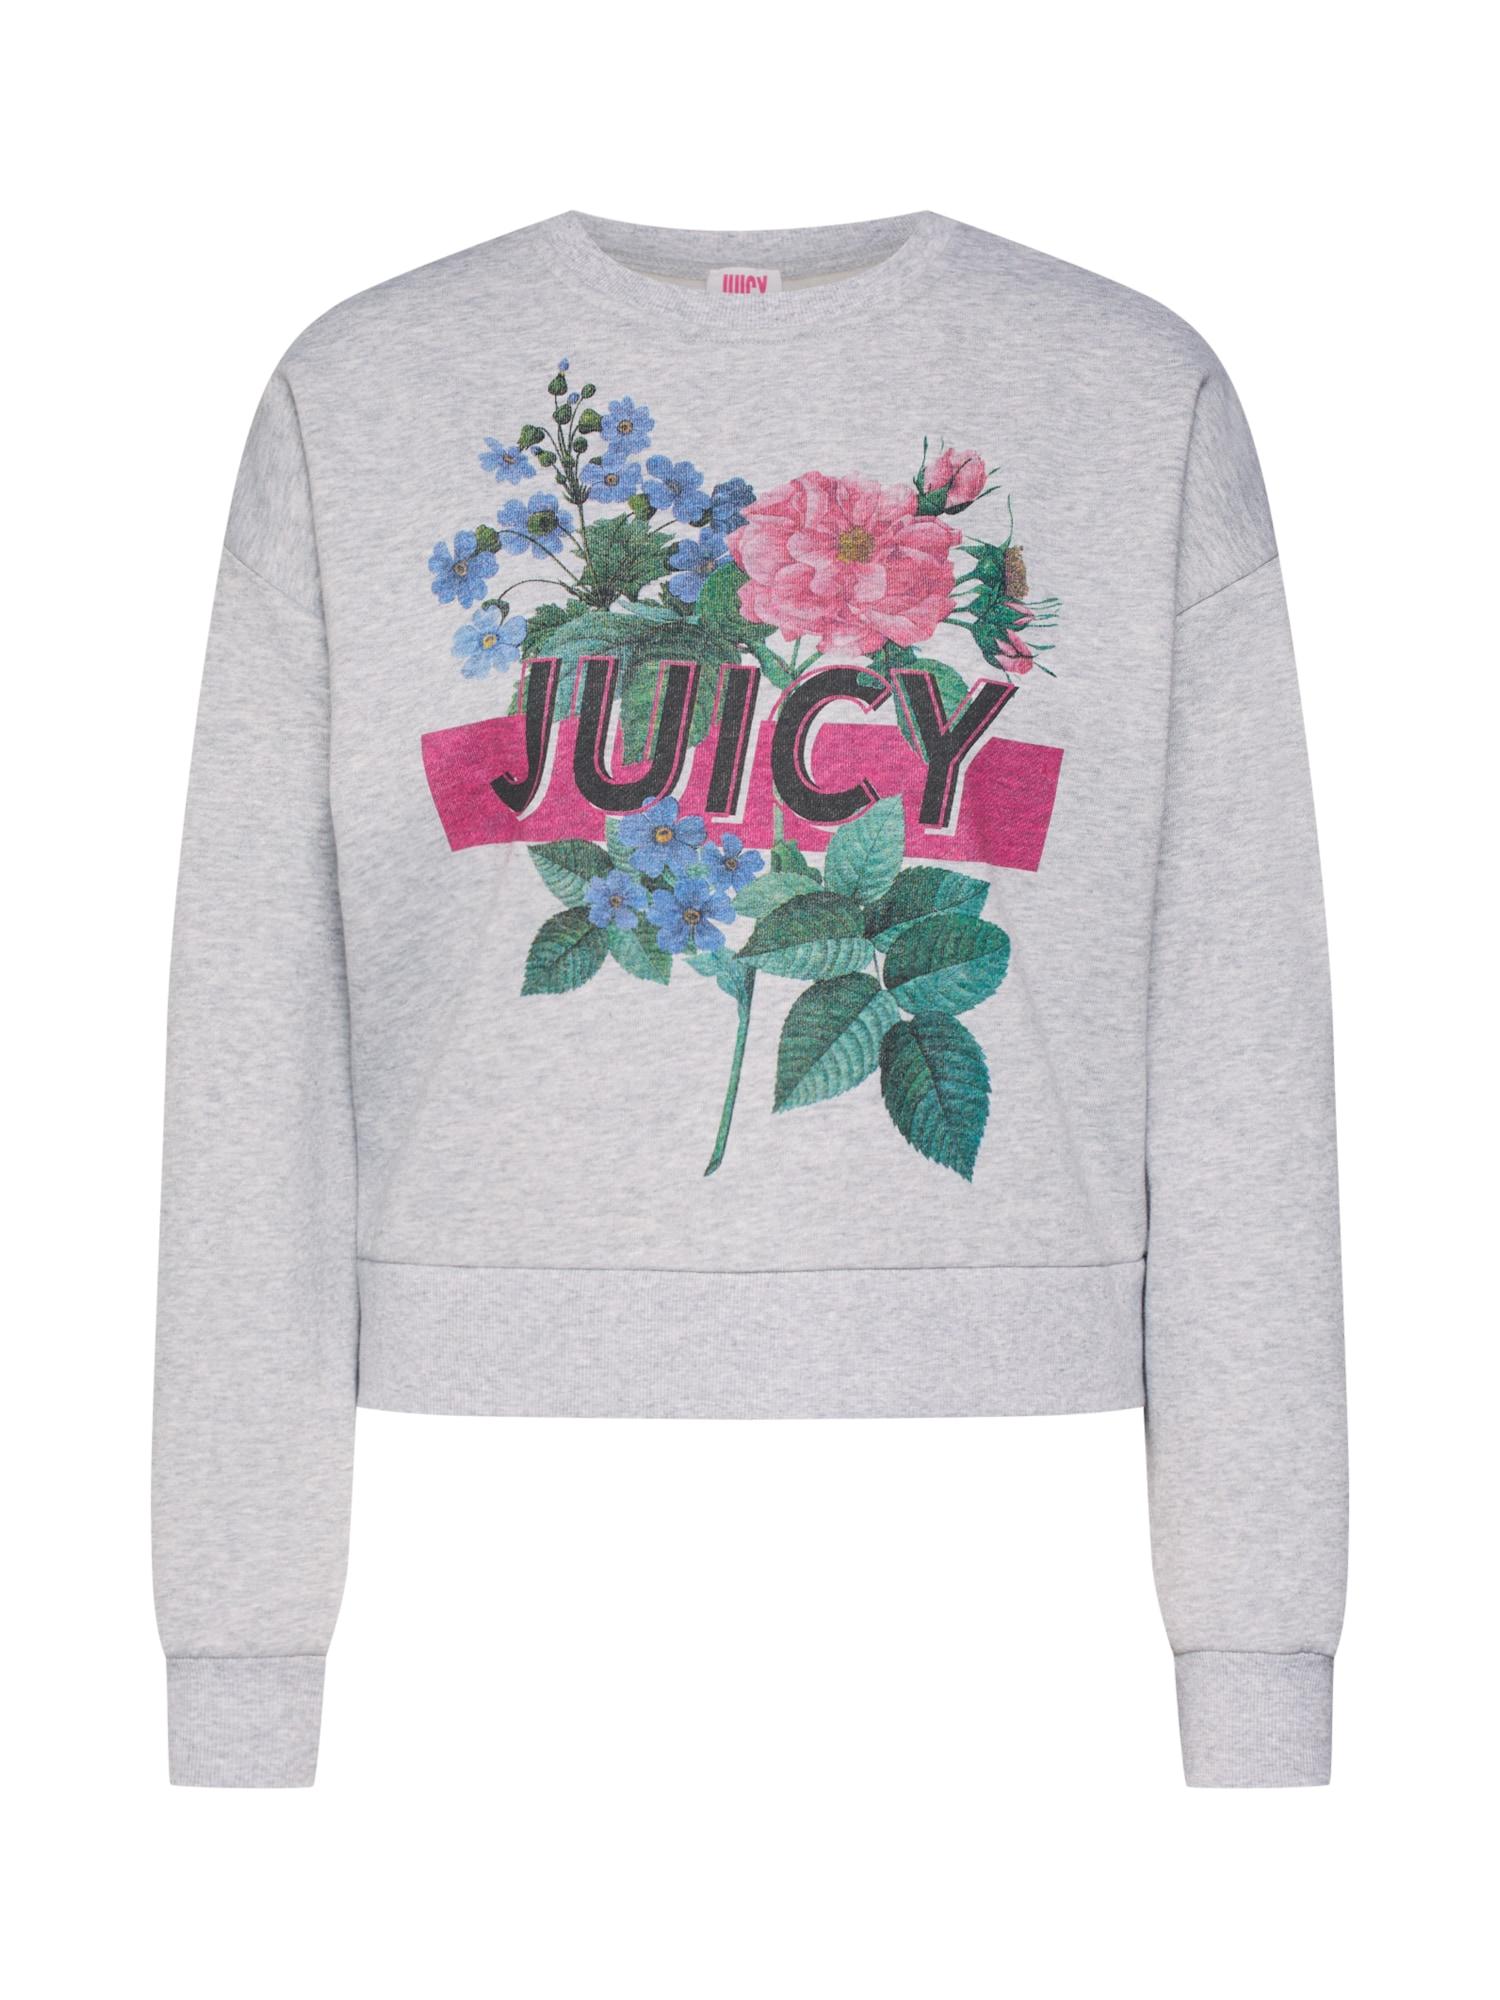 Mikina šedý melír mix barev Juicy By Juicy Couture